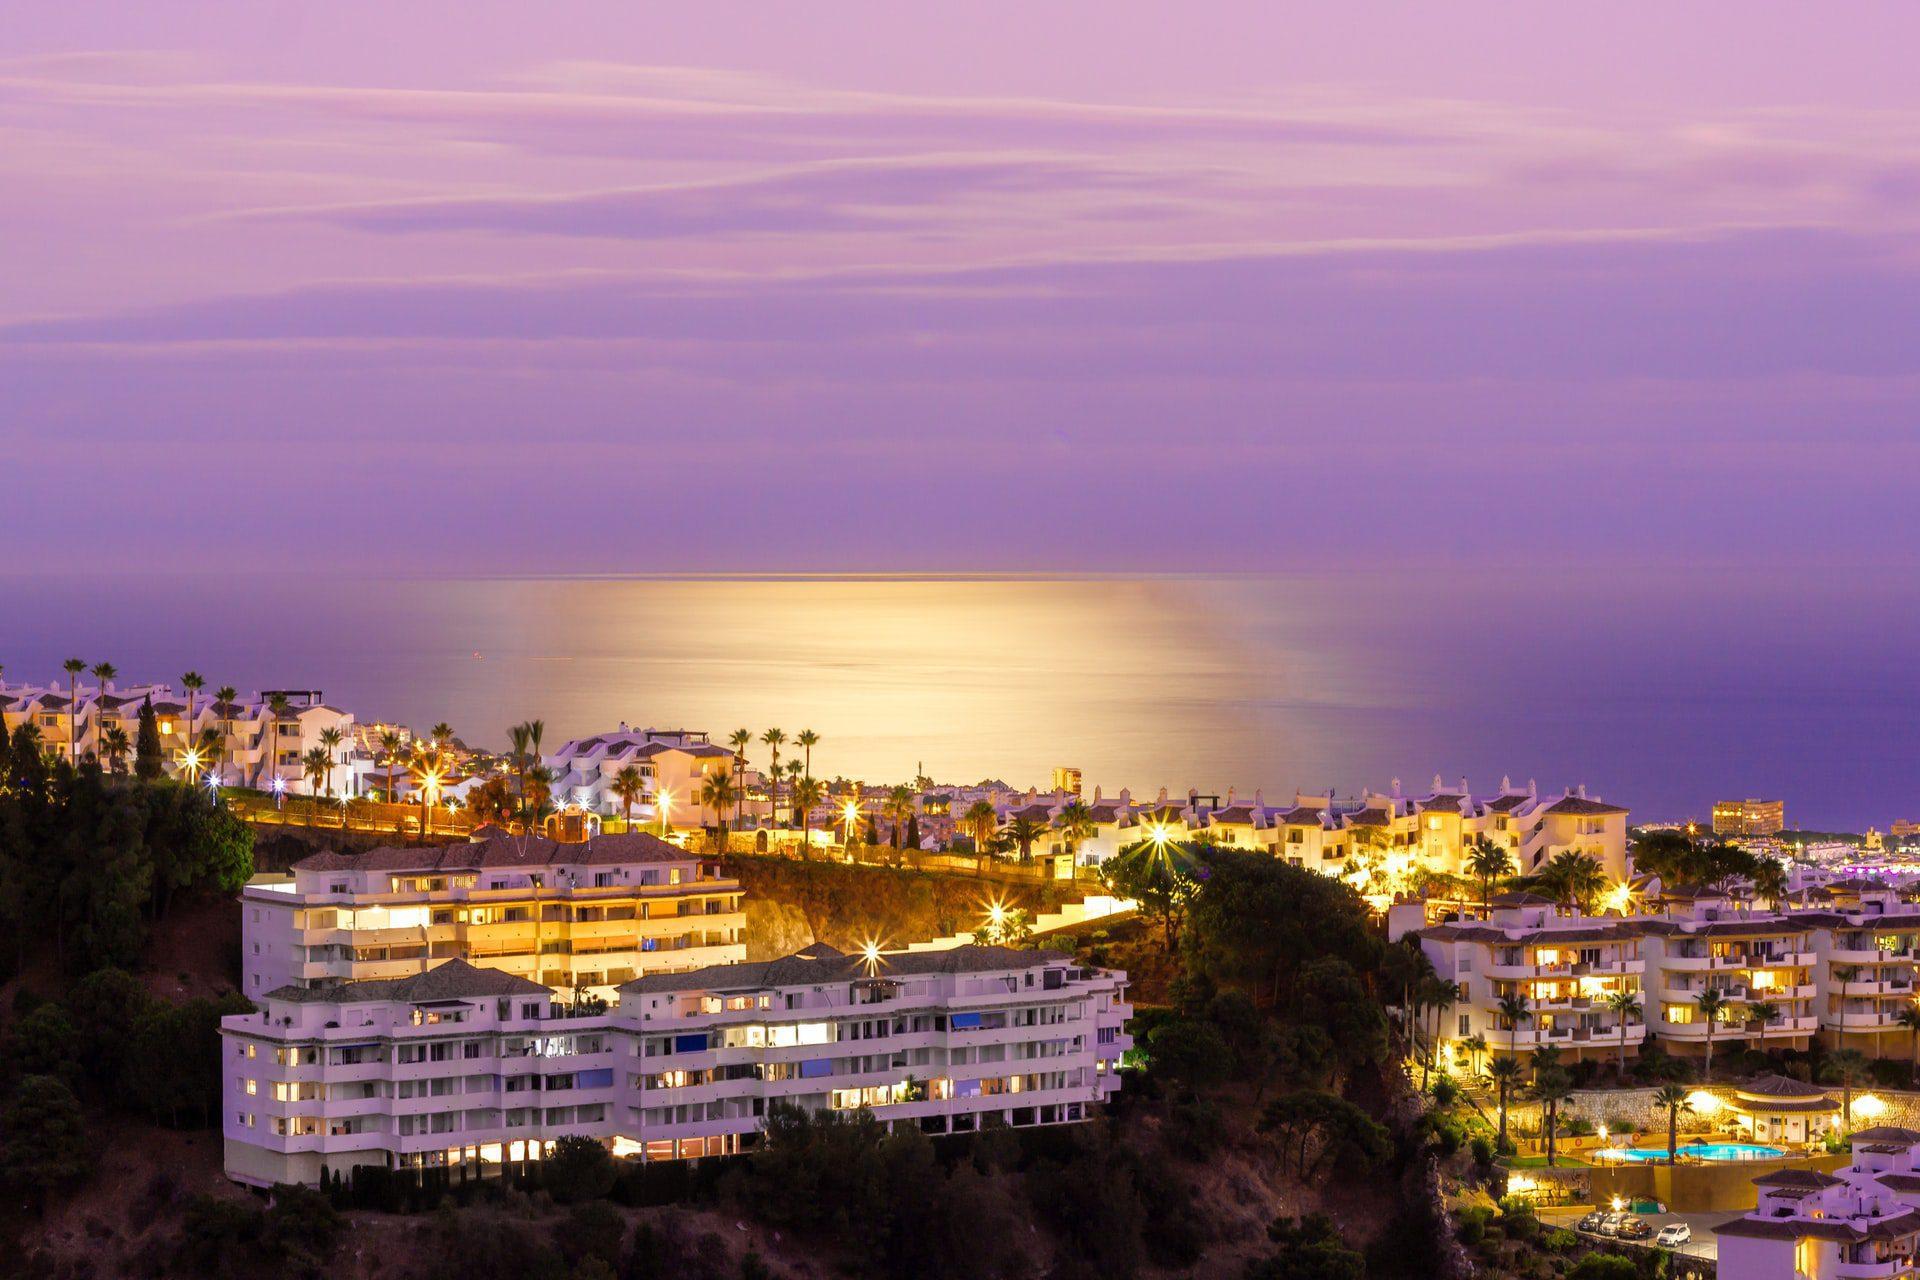 Séjour gay à Marbella